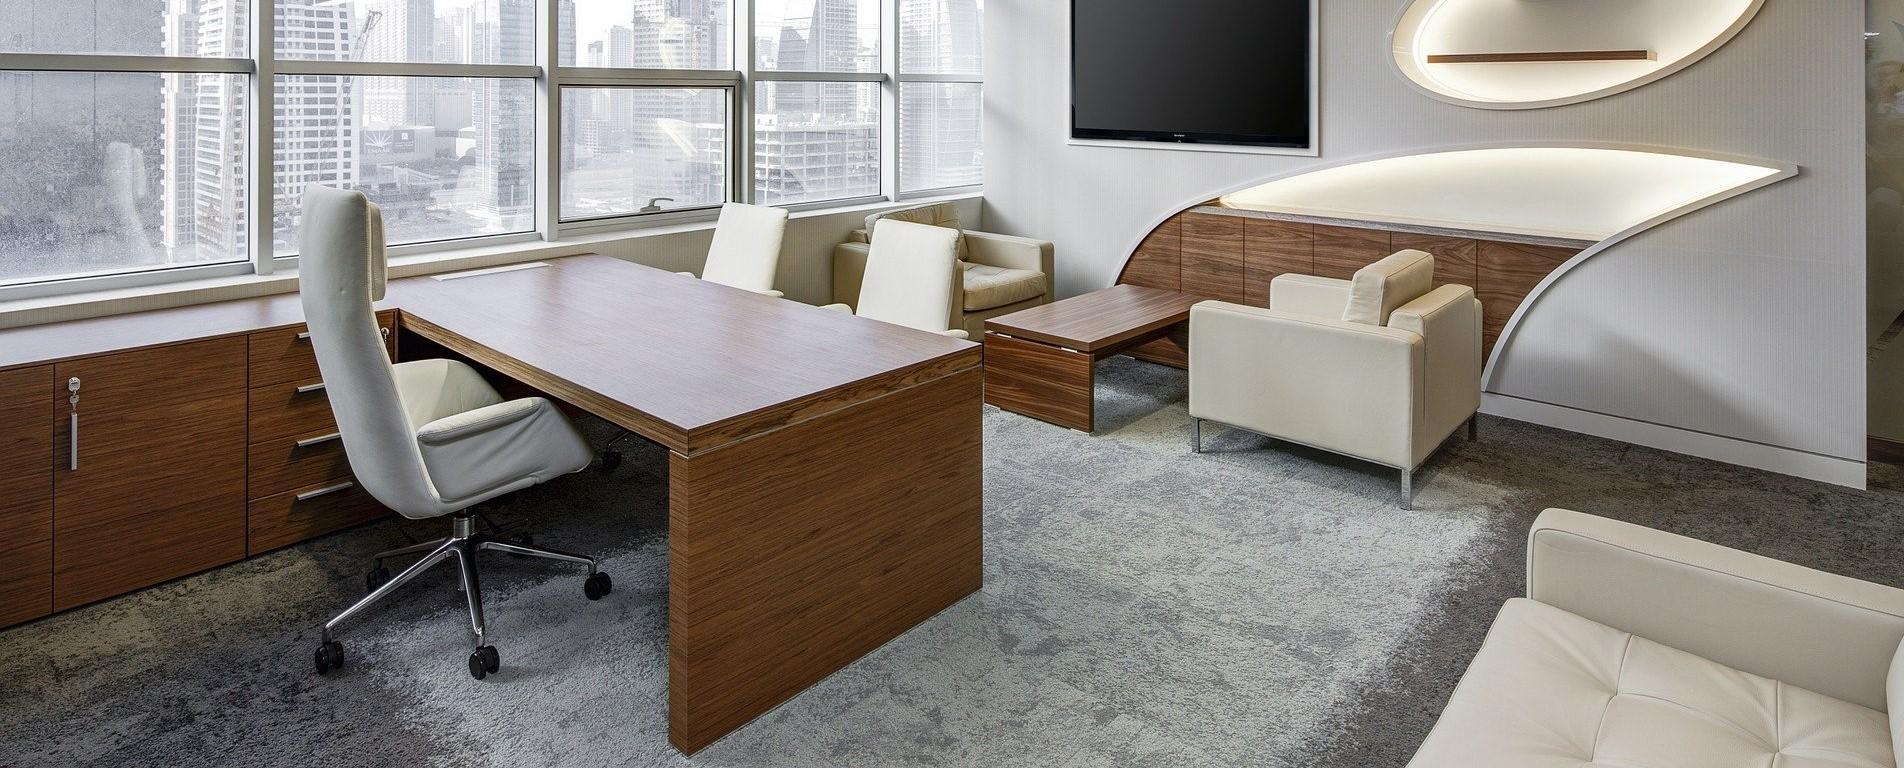 office-730681_1920-1